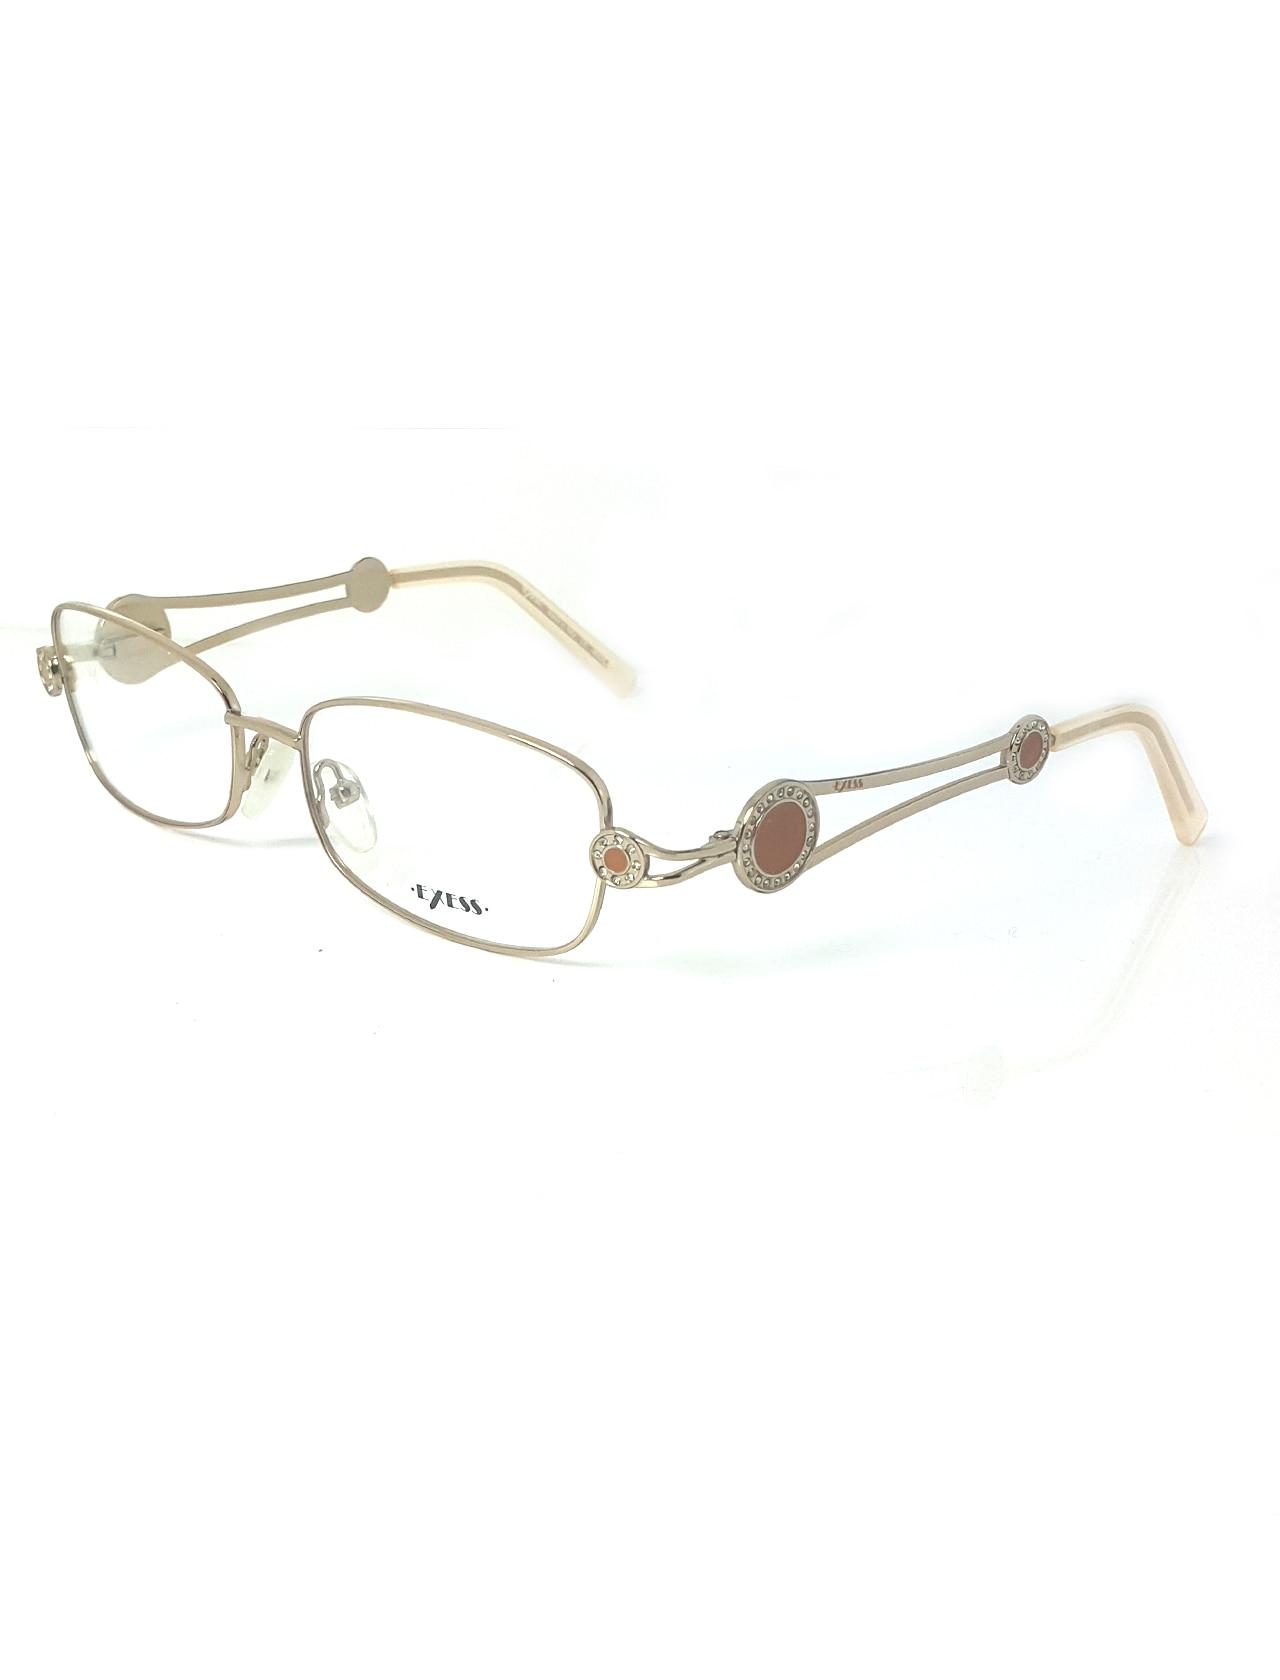 Markamilla Women Reading Glasses Frame Demo Glasses Eyewear Transparent High Quality WomenExess E 3285 100 52